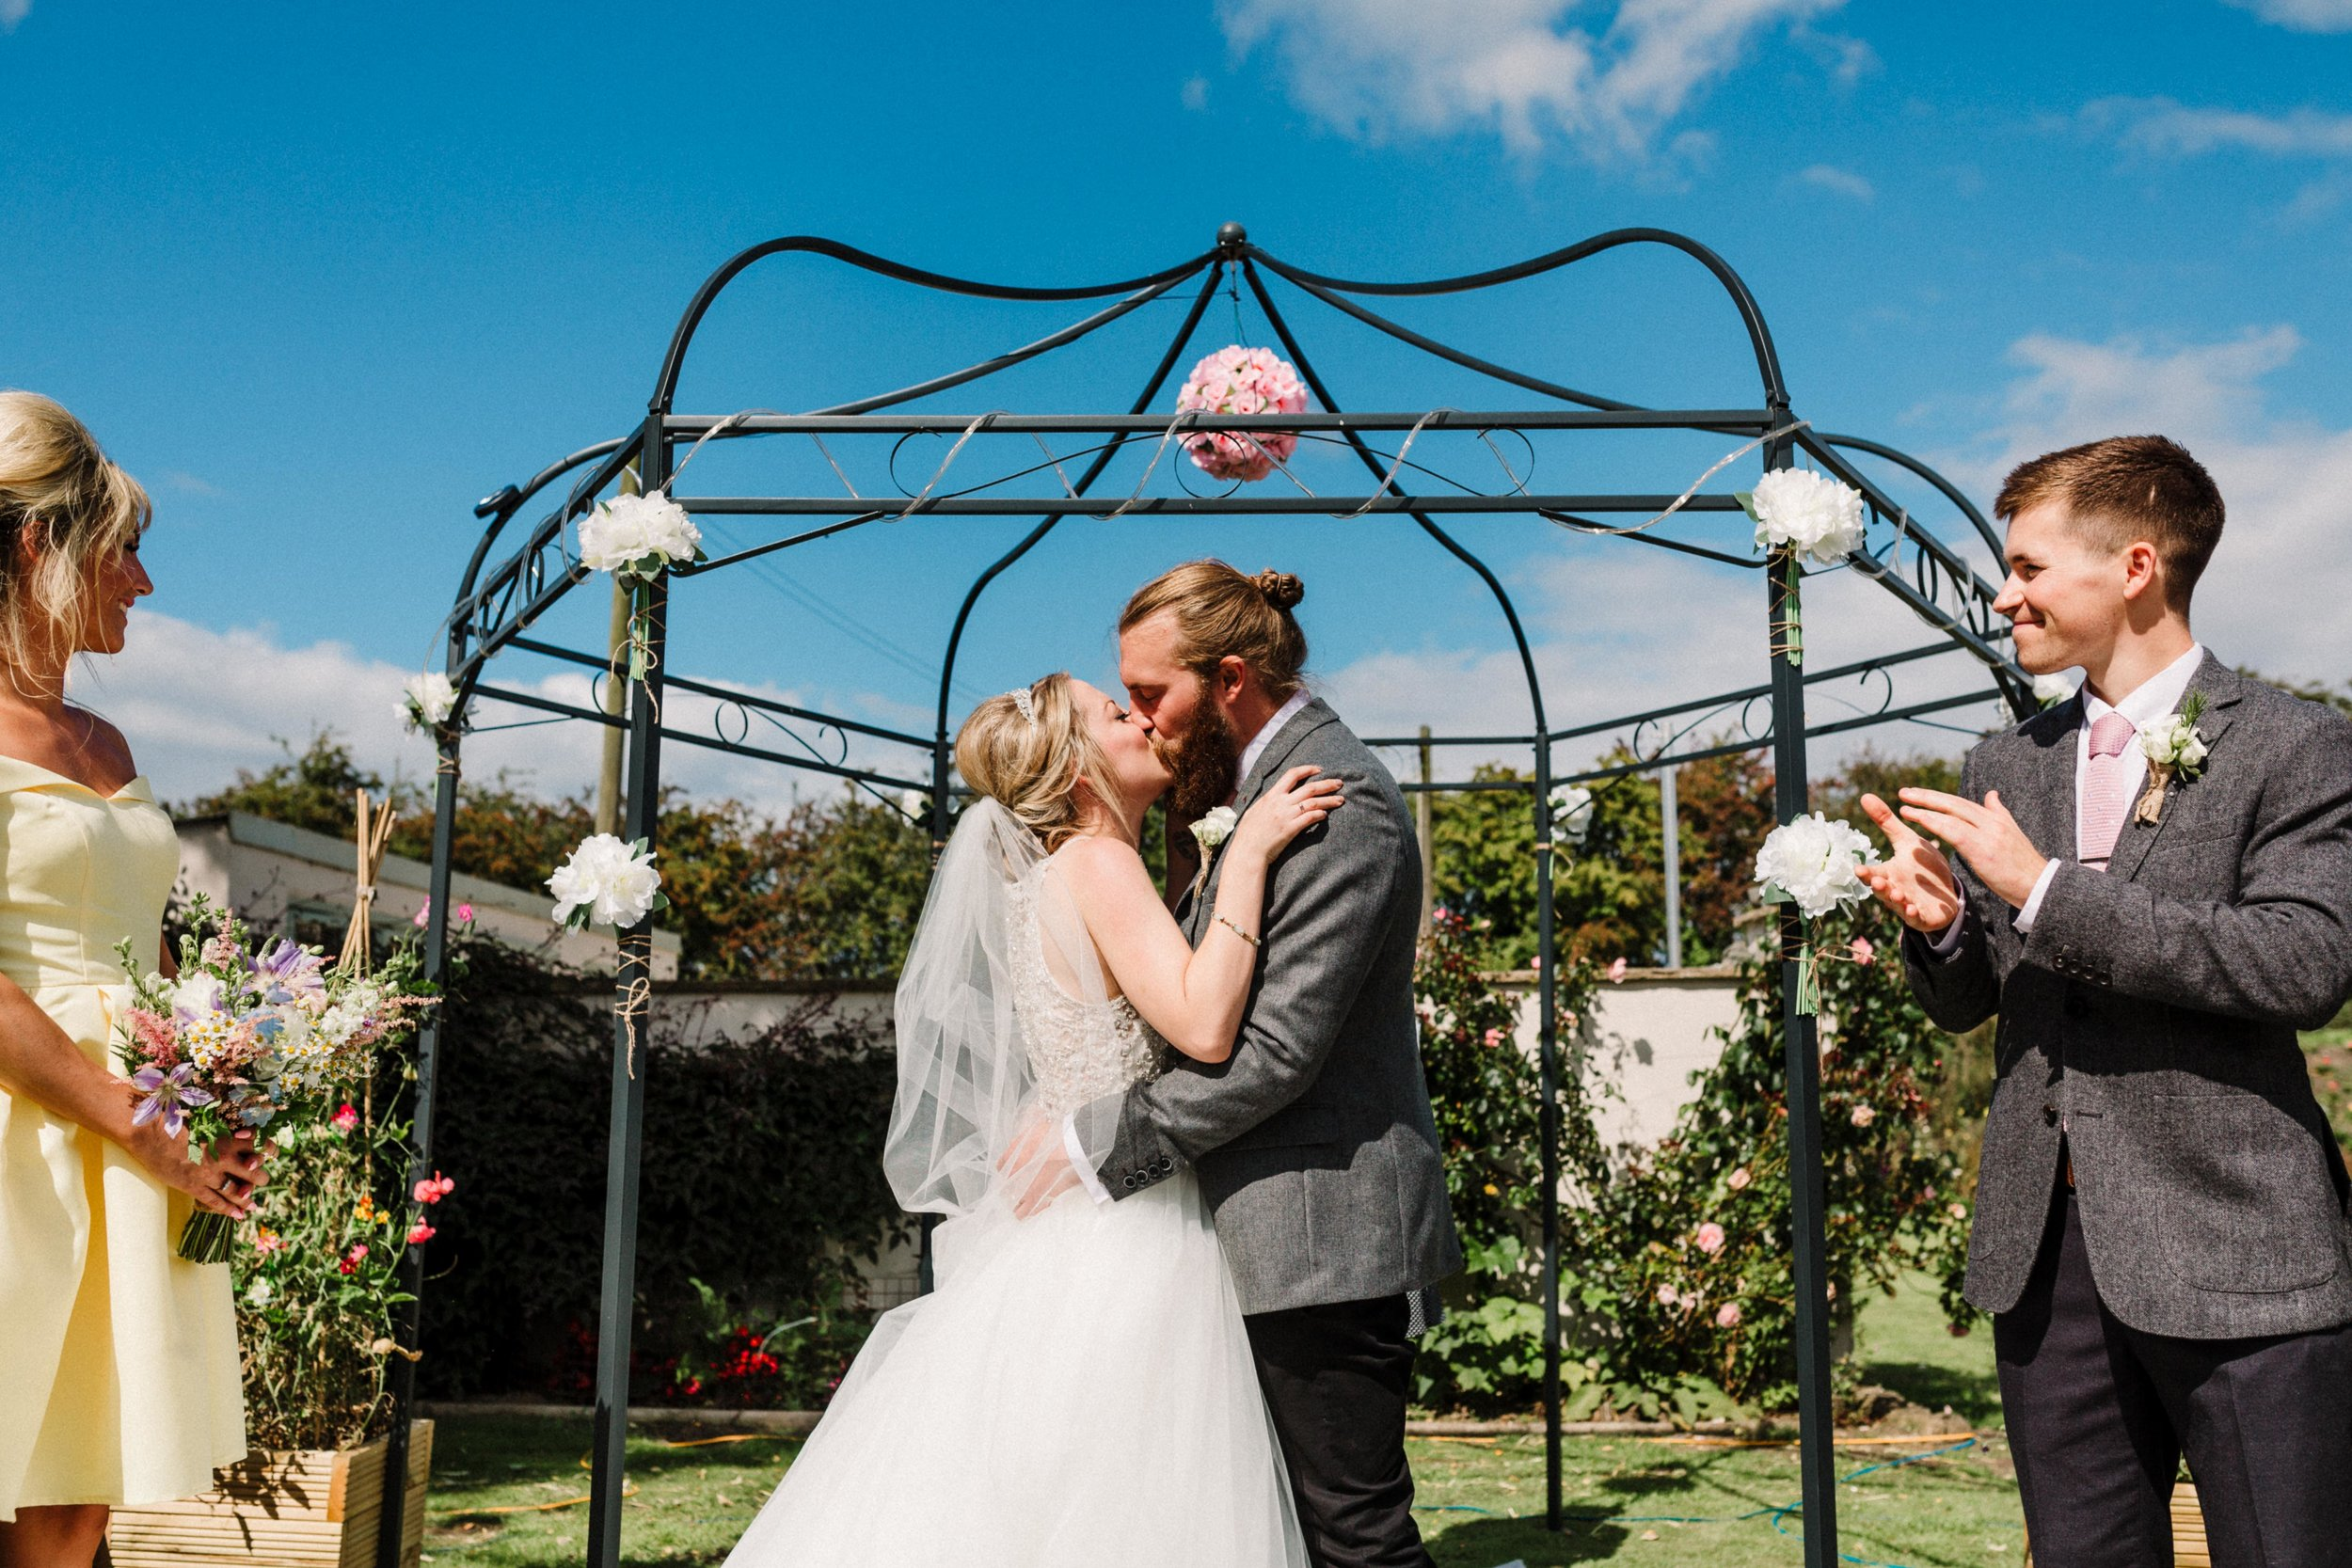 A bride and groom having their first kiss at a Leeds garden wedding